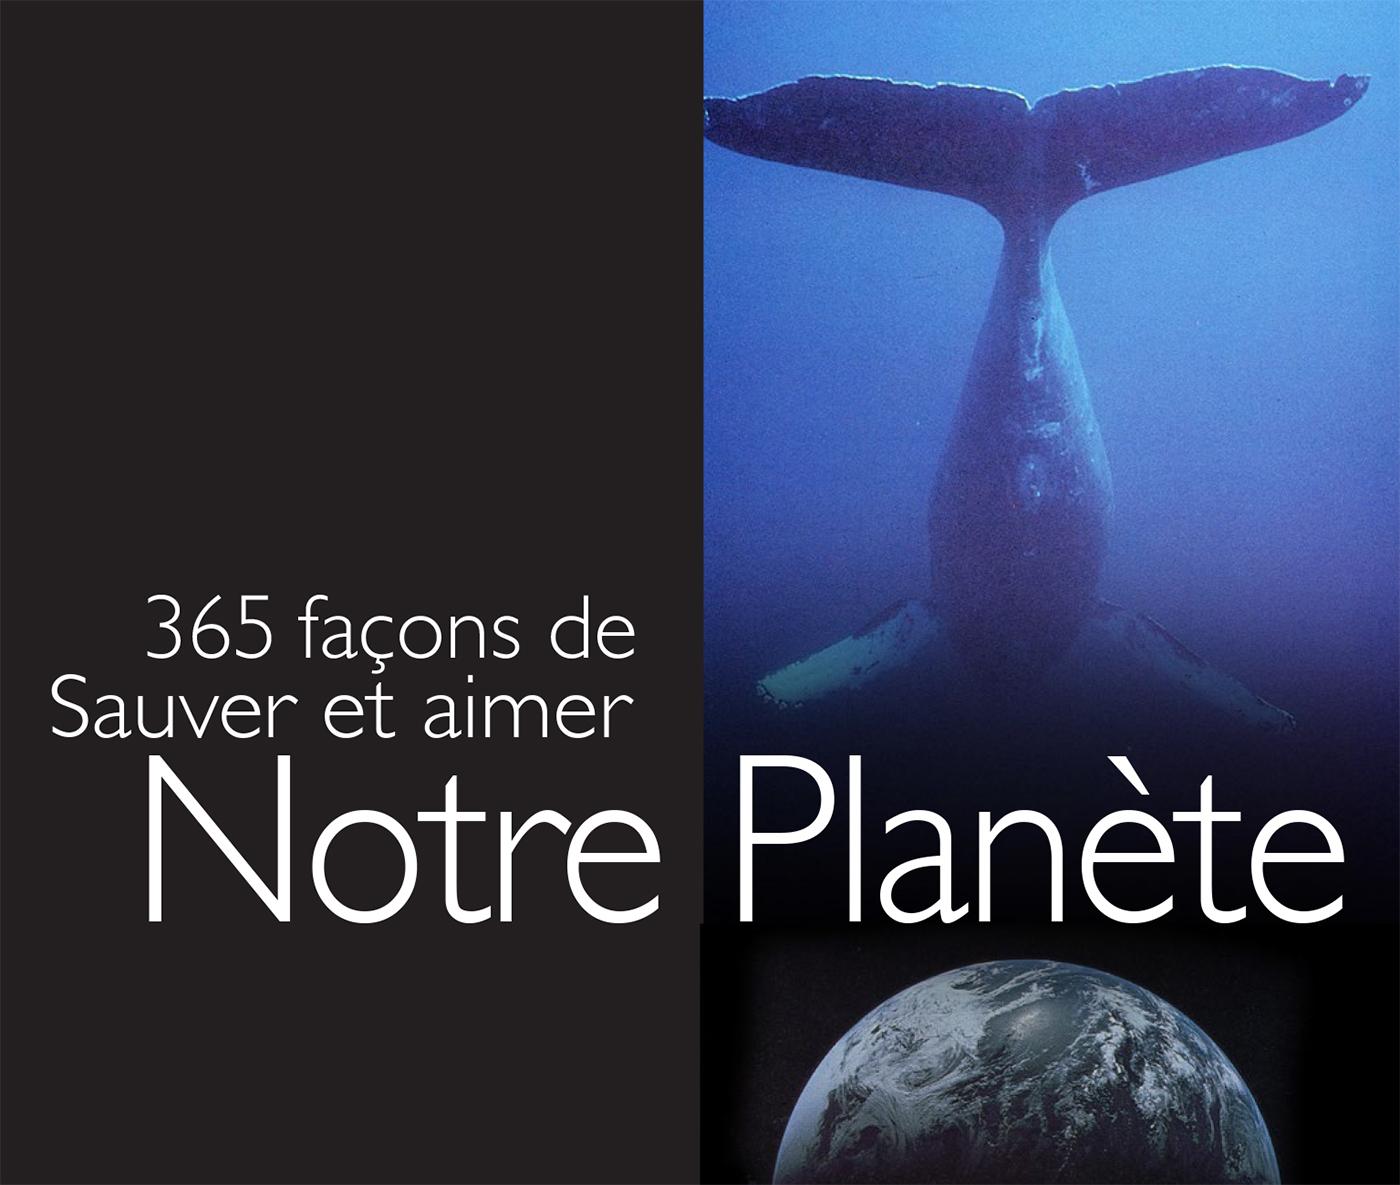 365 FACONS DE SAUVER LA PLANETE